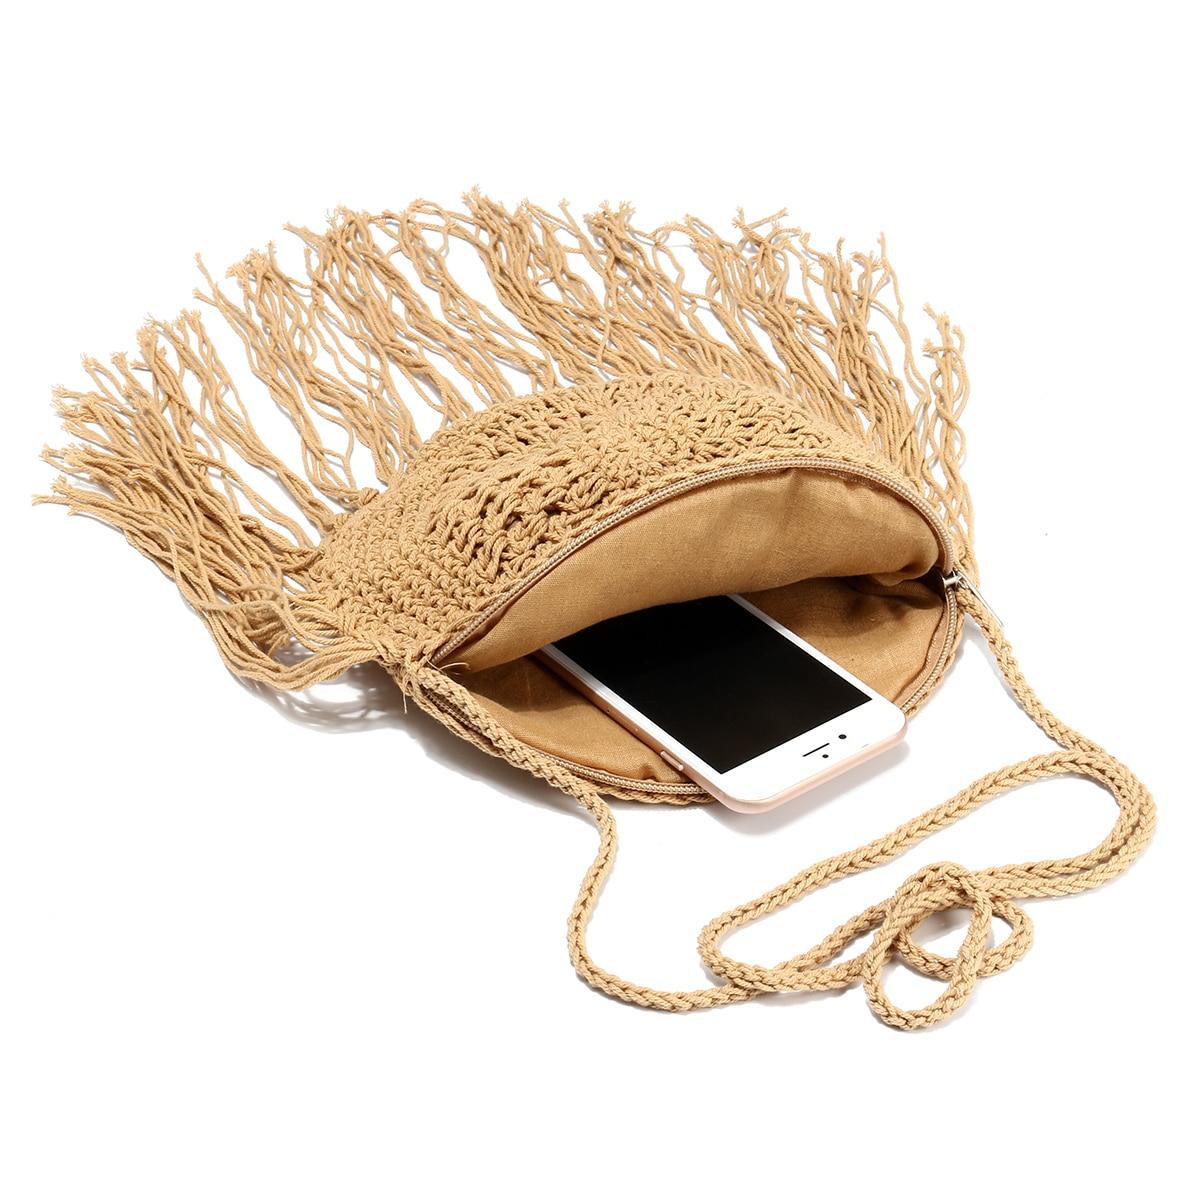 Round Straw Bag with Fringe Tassel 3